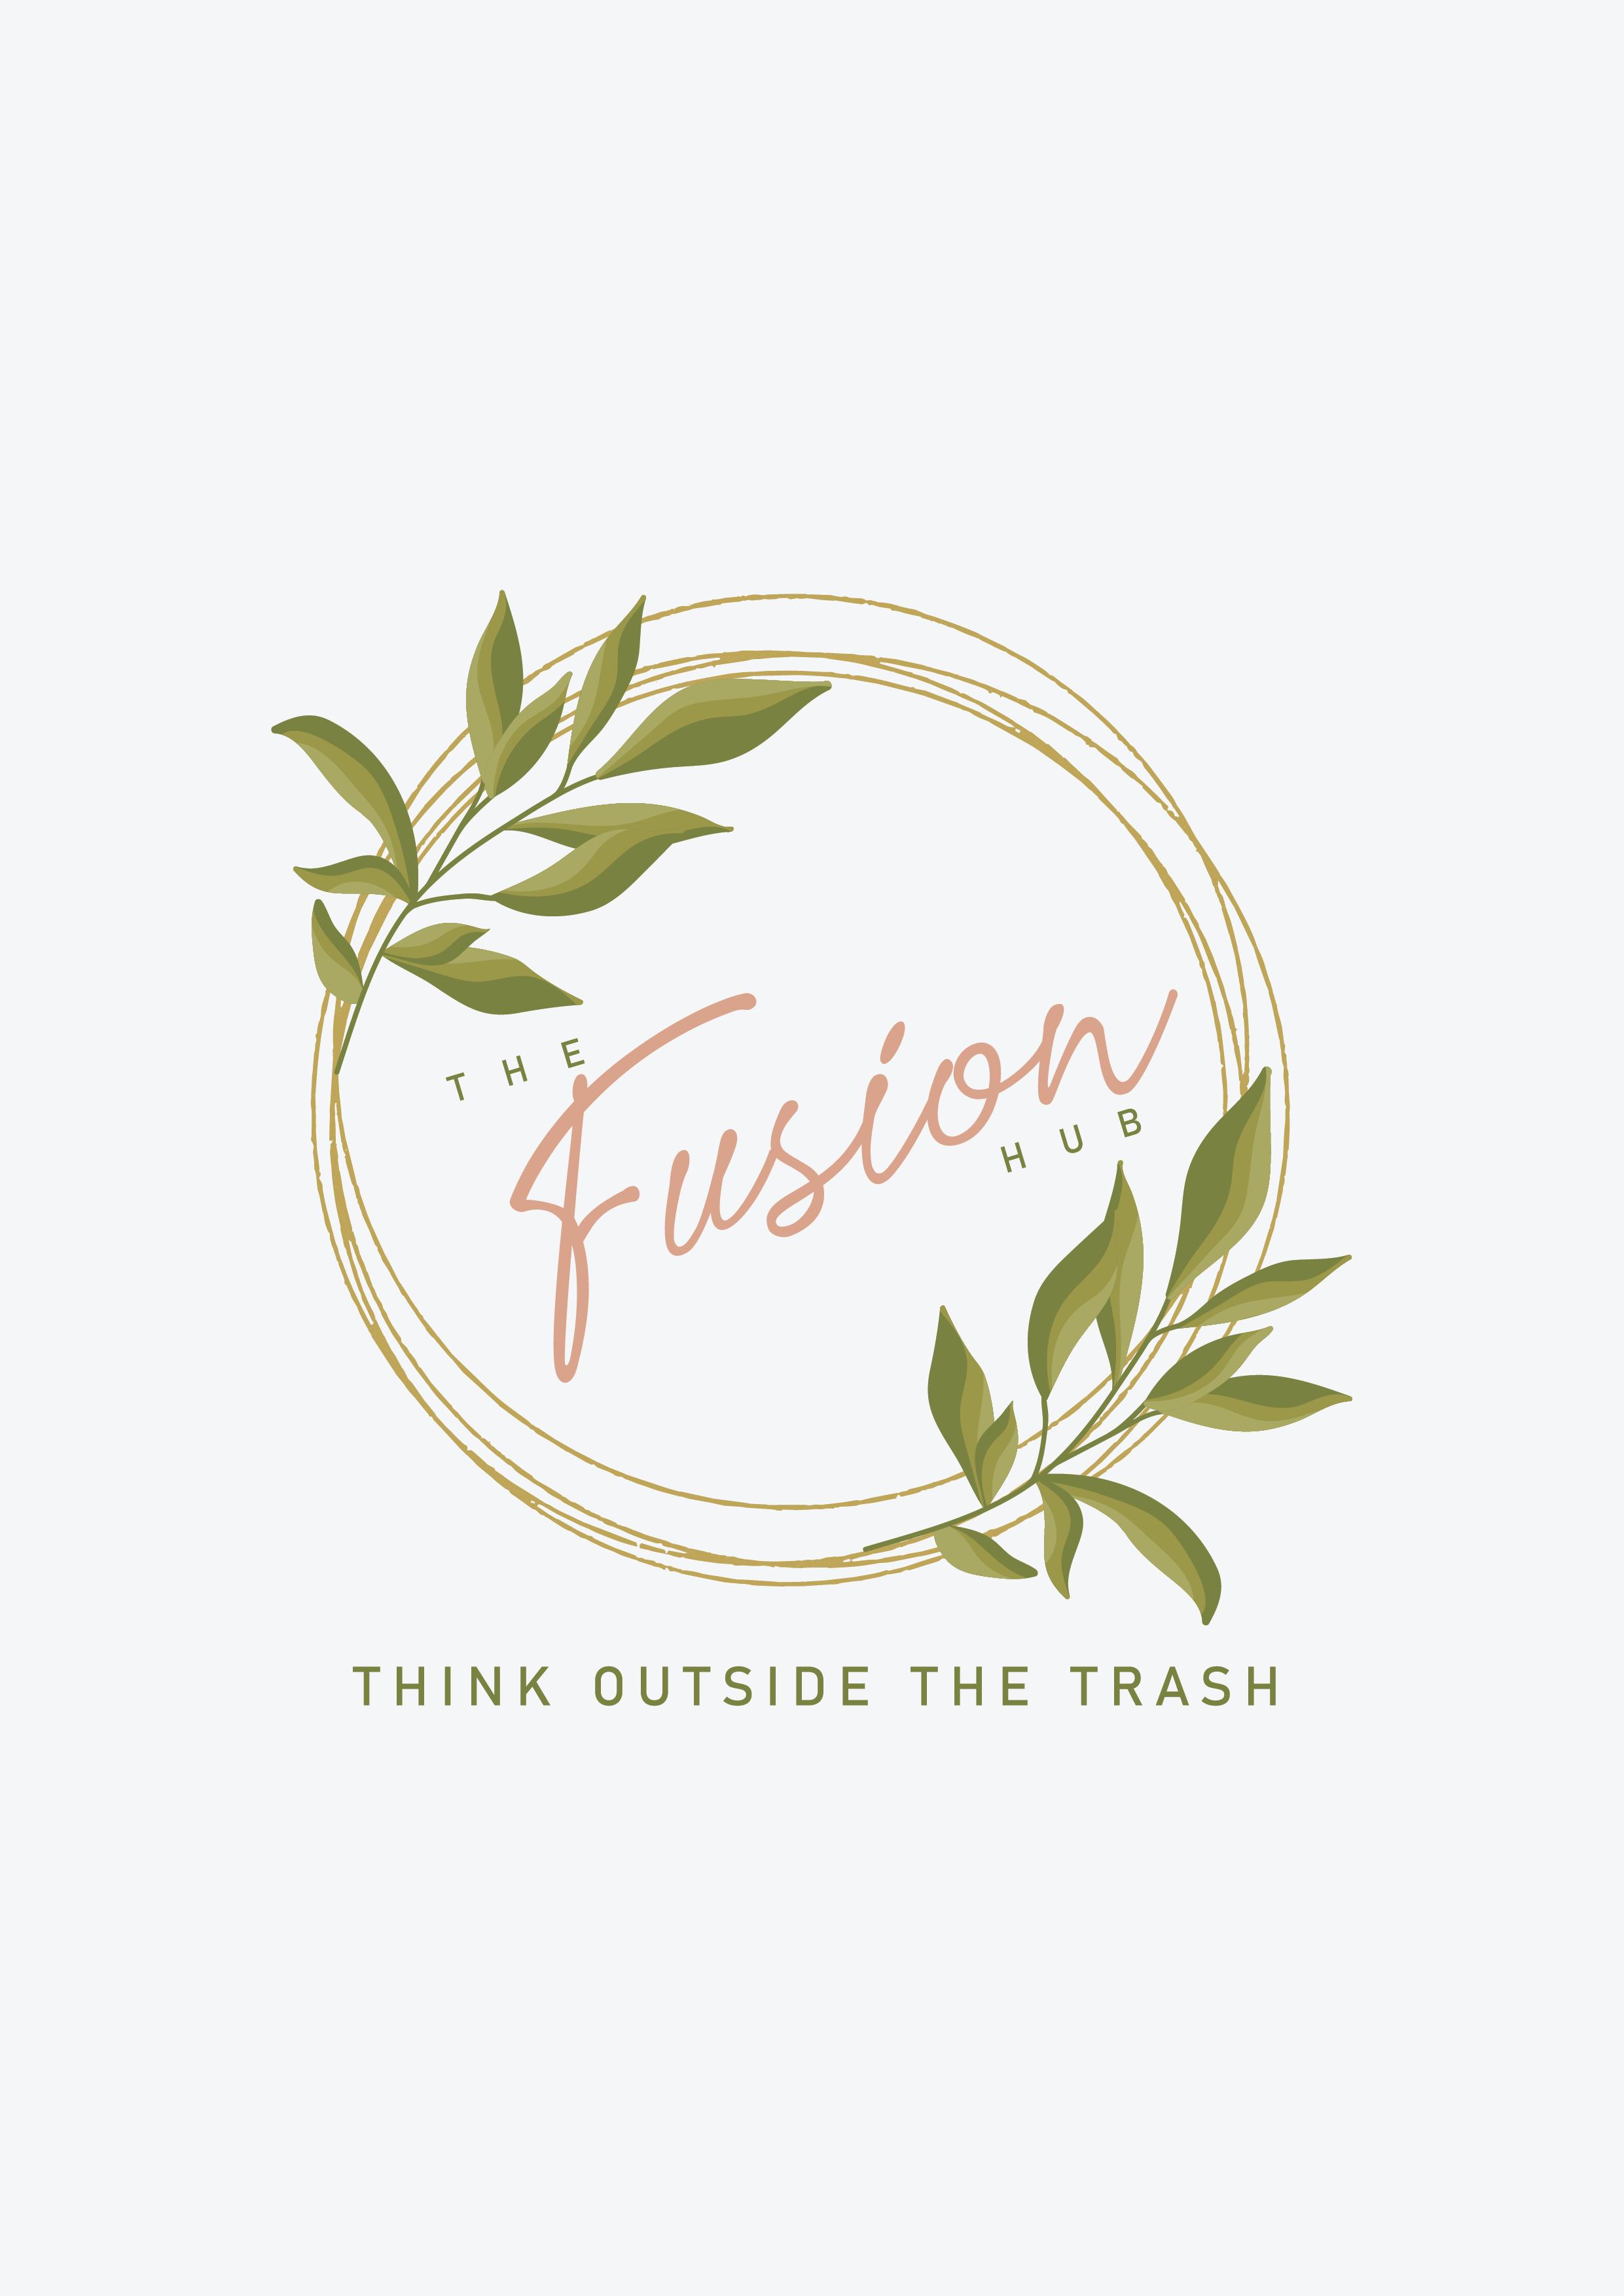 The Fusion Hub